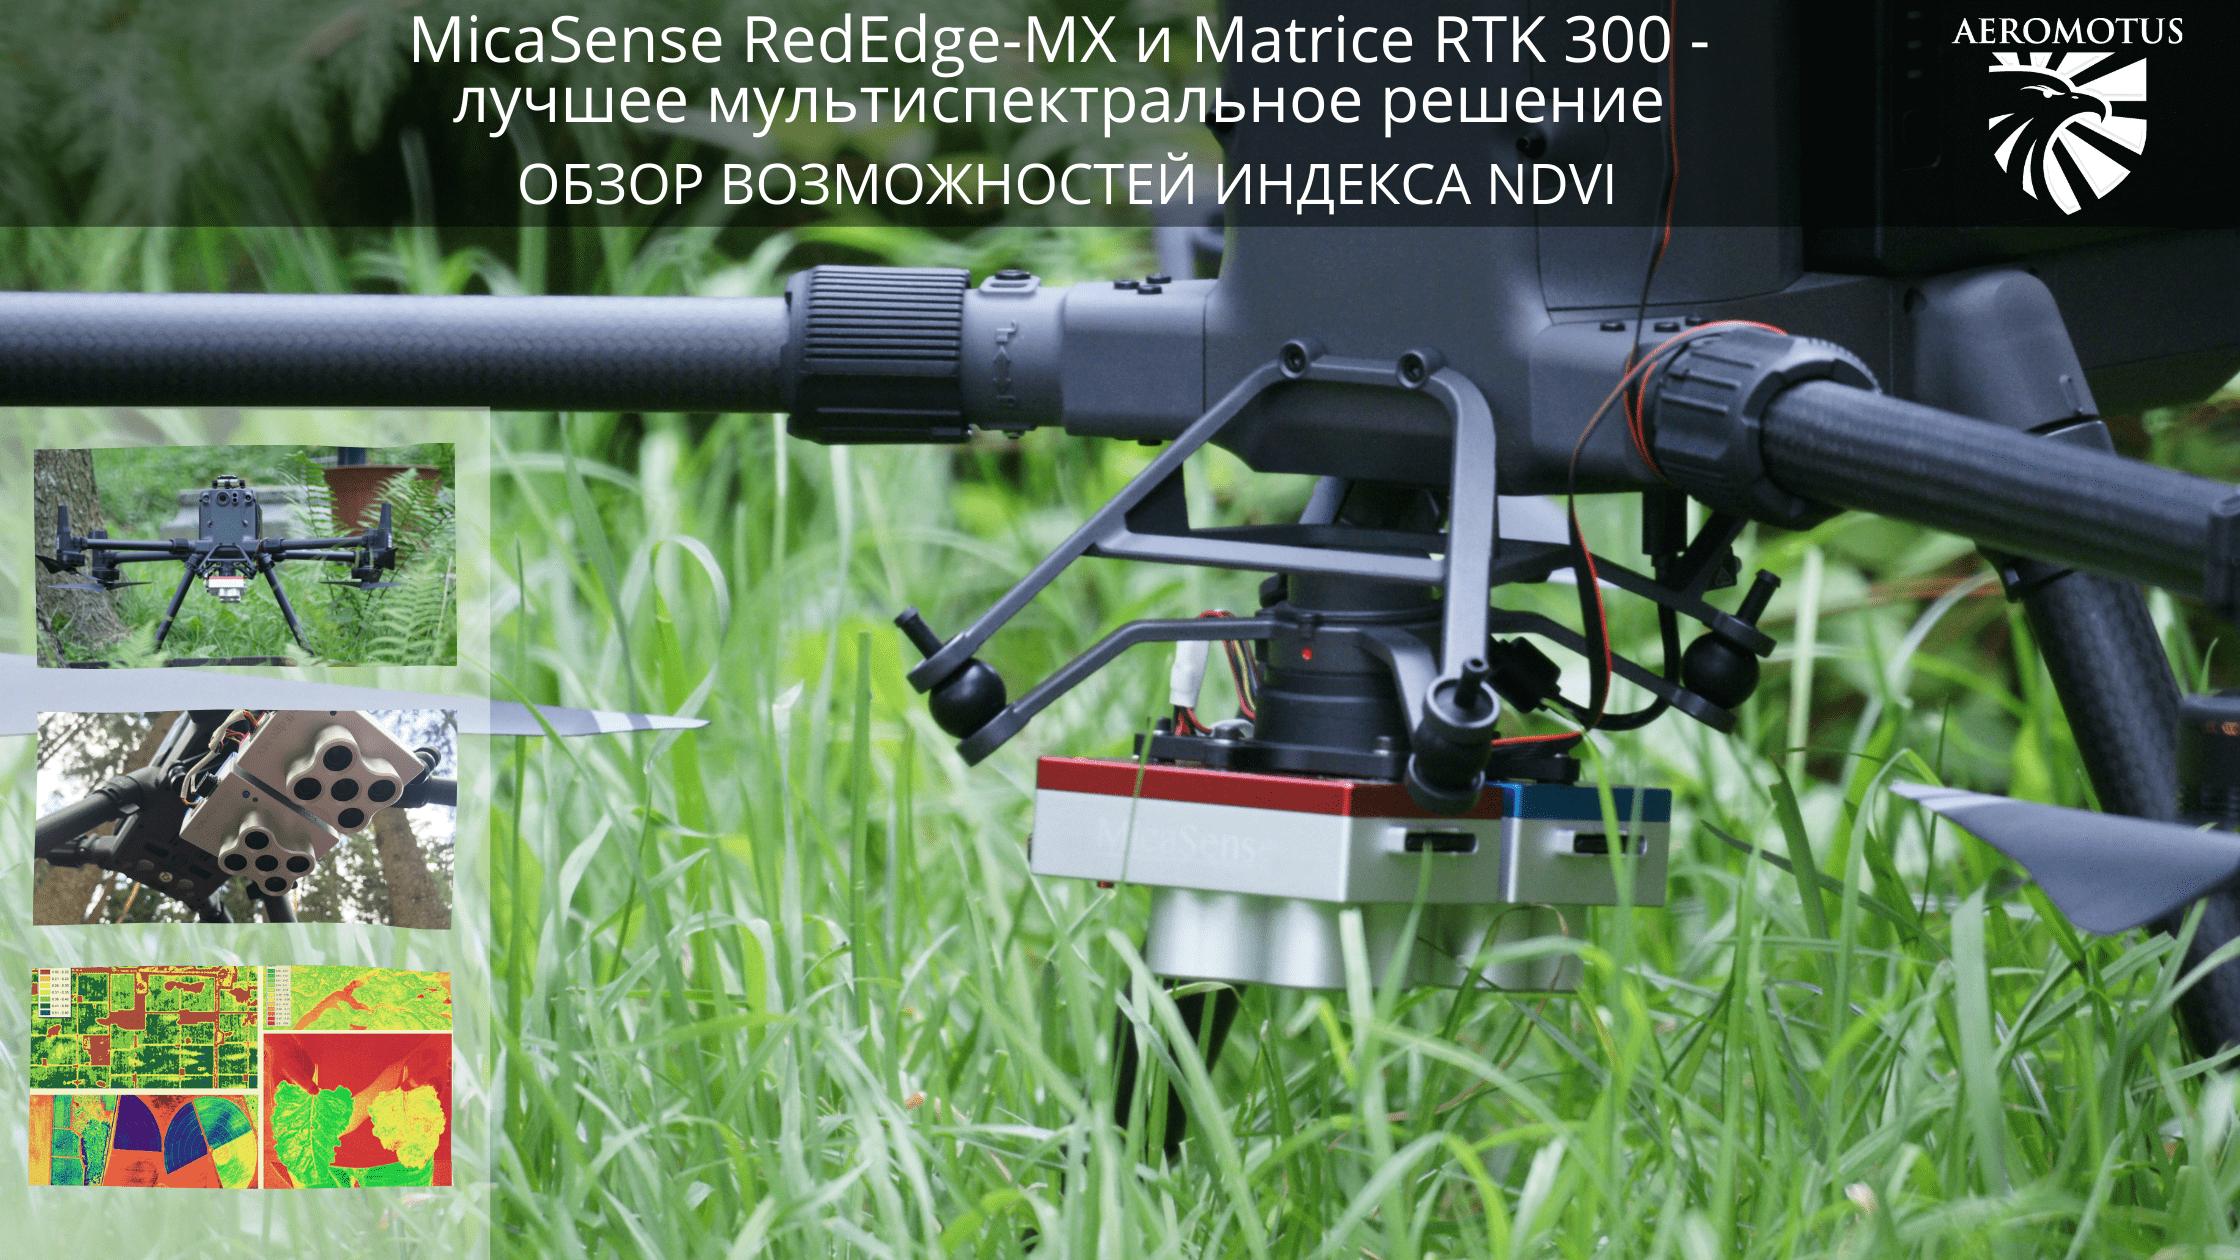 MicaSense Rededge MX Dual на M300